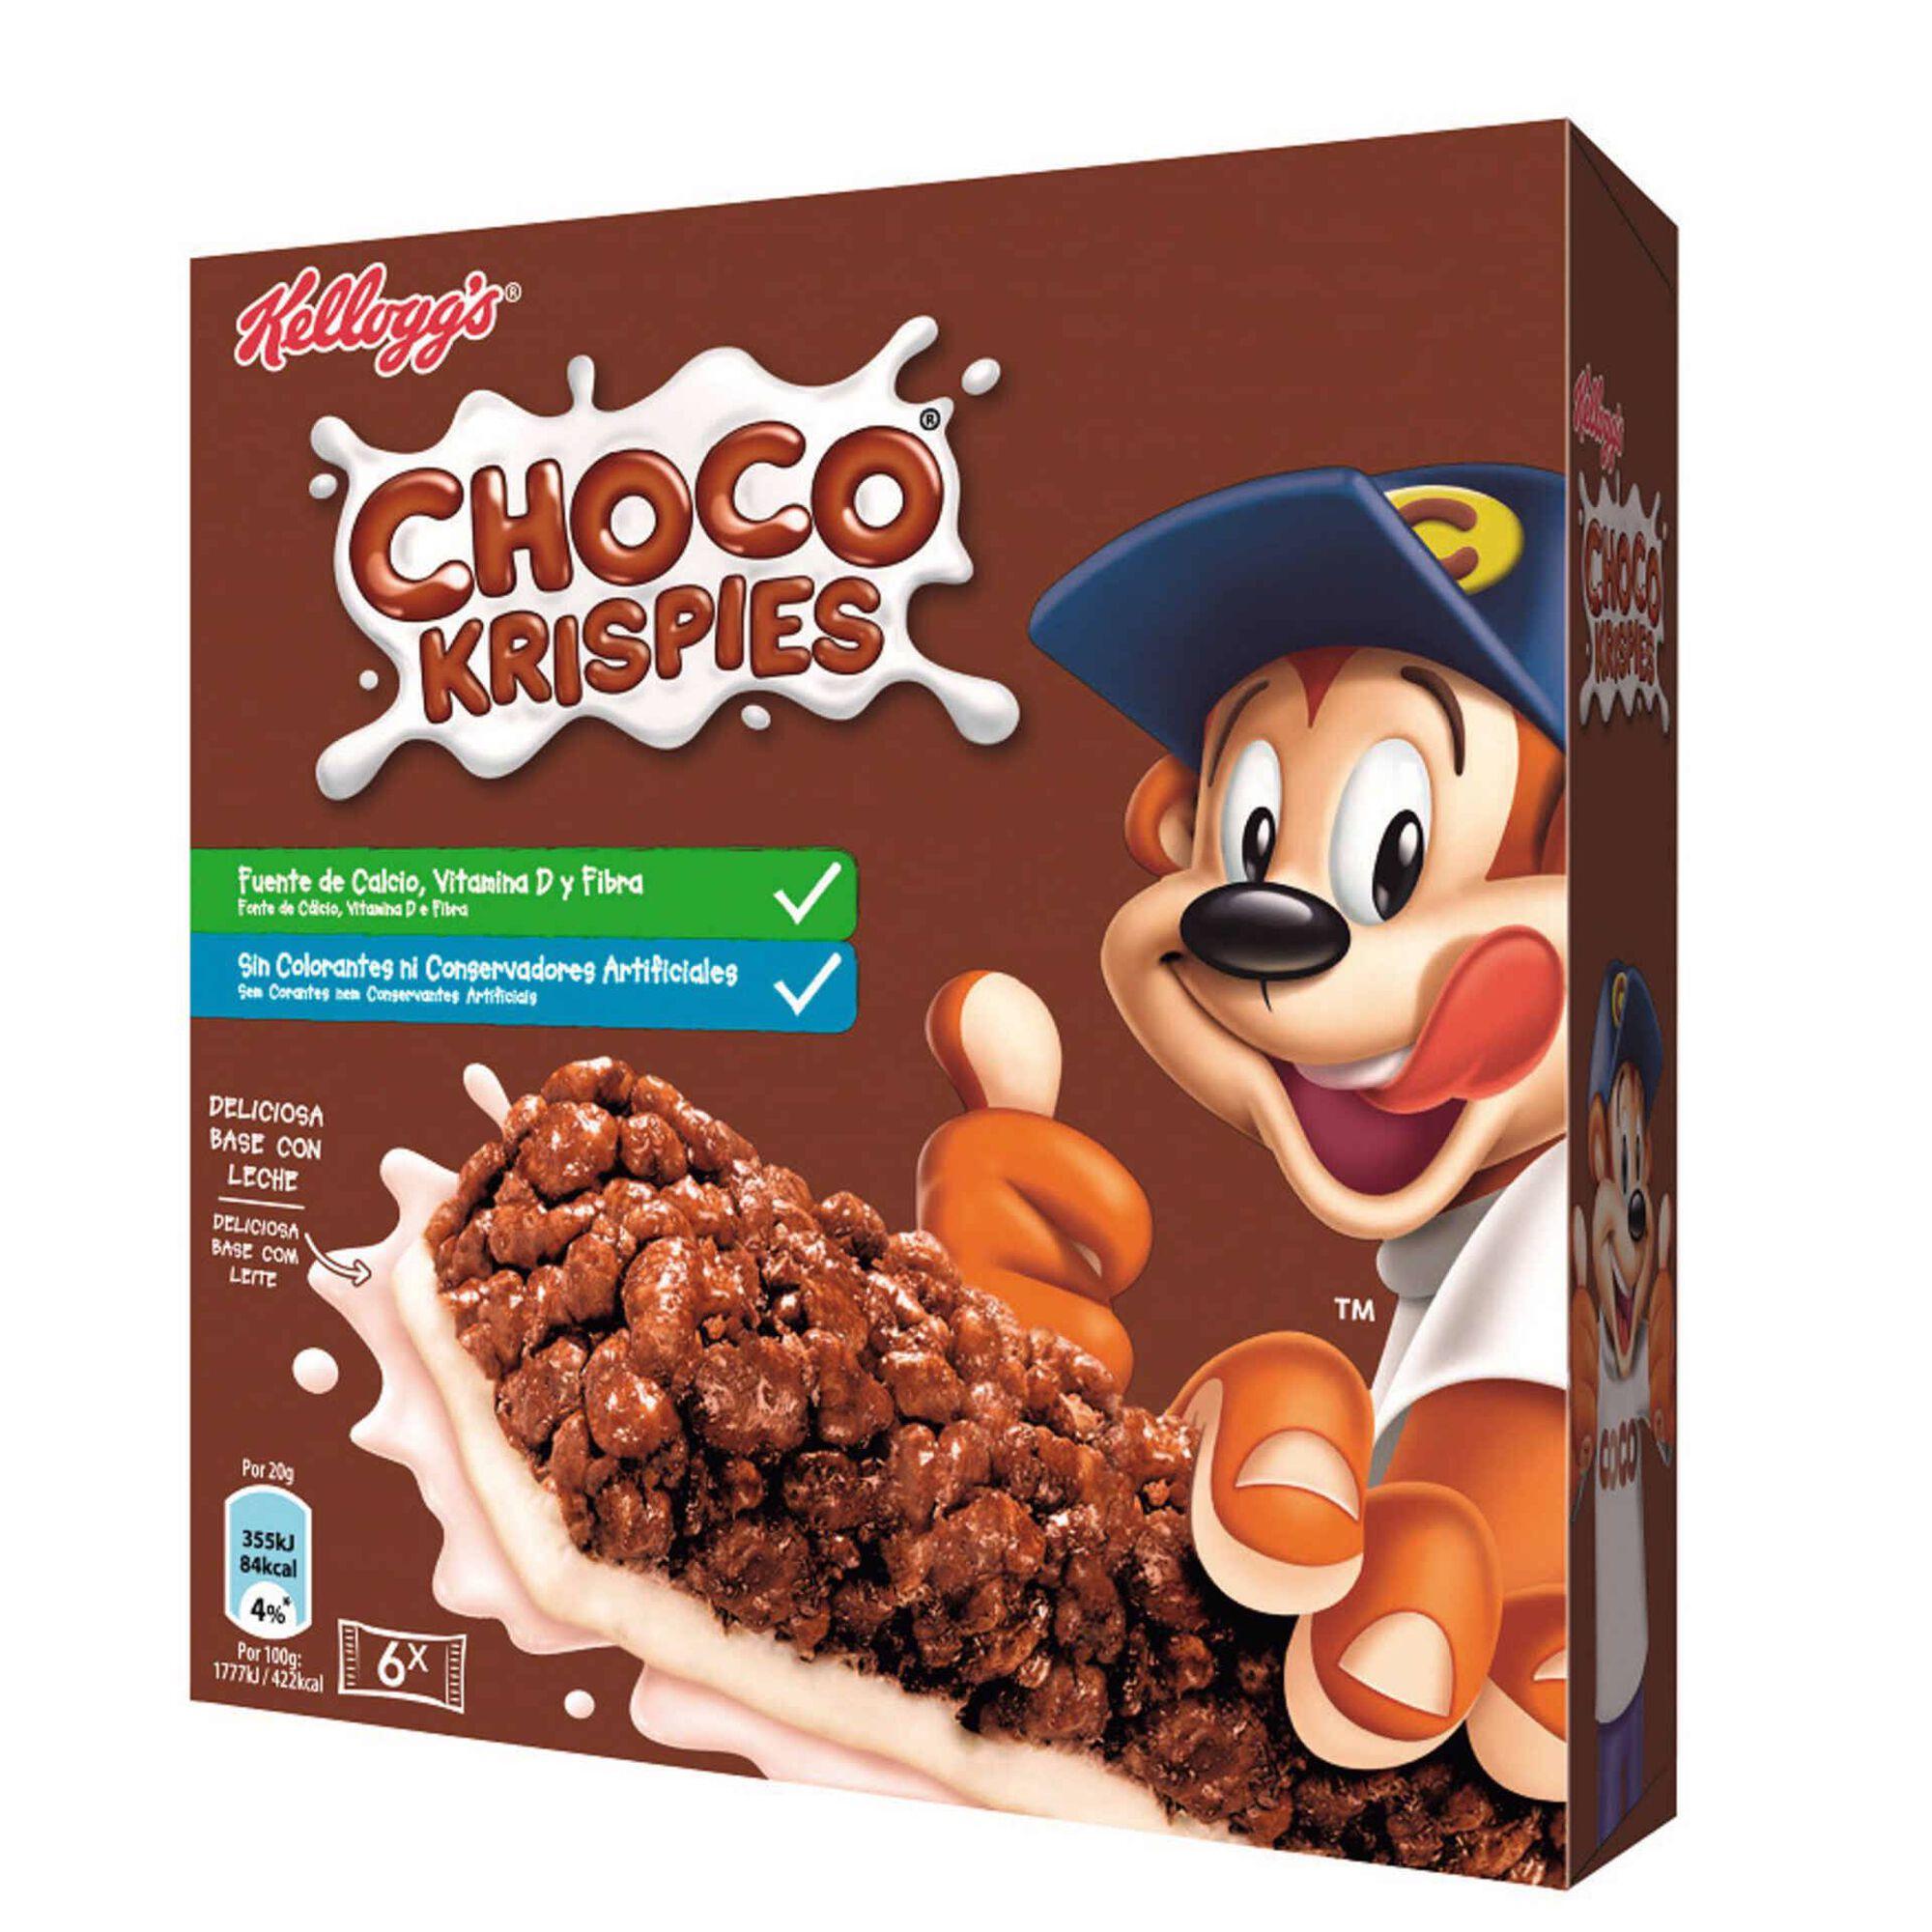 Barras de Cereais Chocolate Choco Krispies